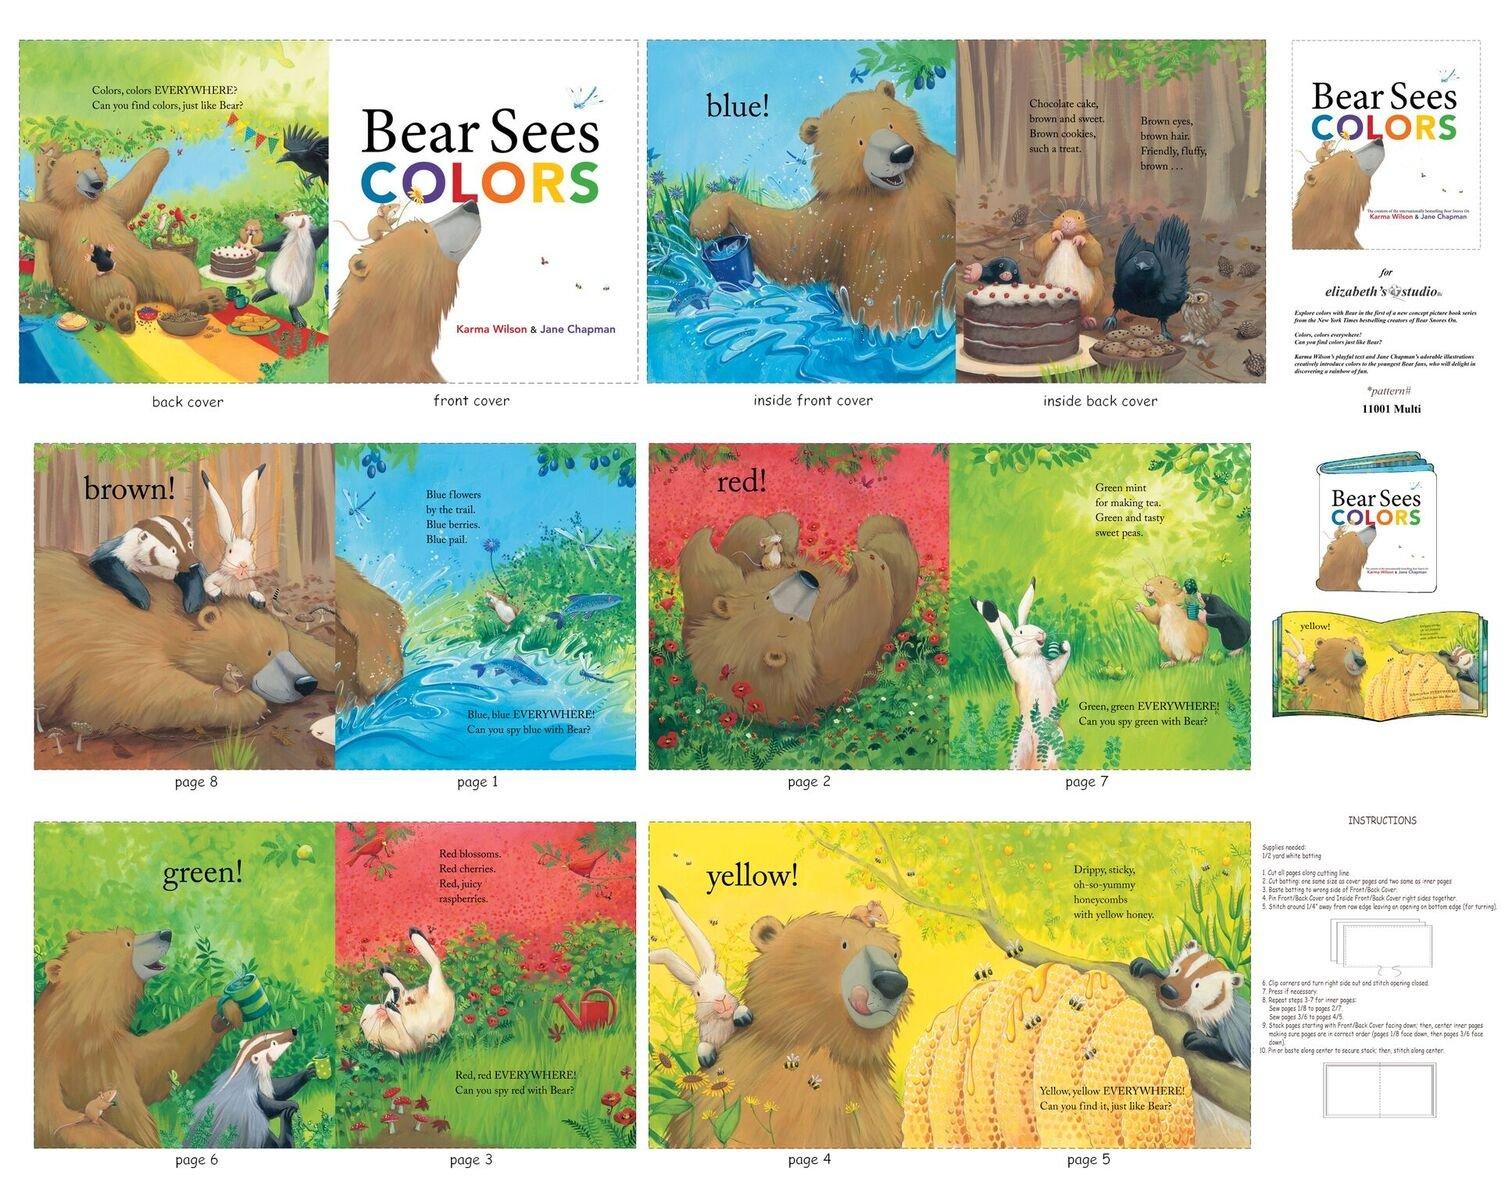 ES-Bear Sees Colors 11001 Multi 36 Panel - Softbook